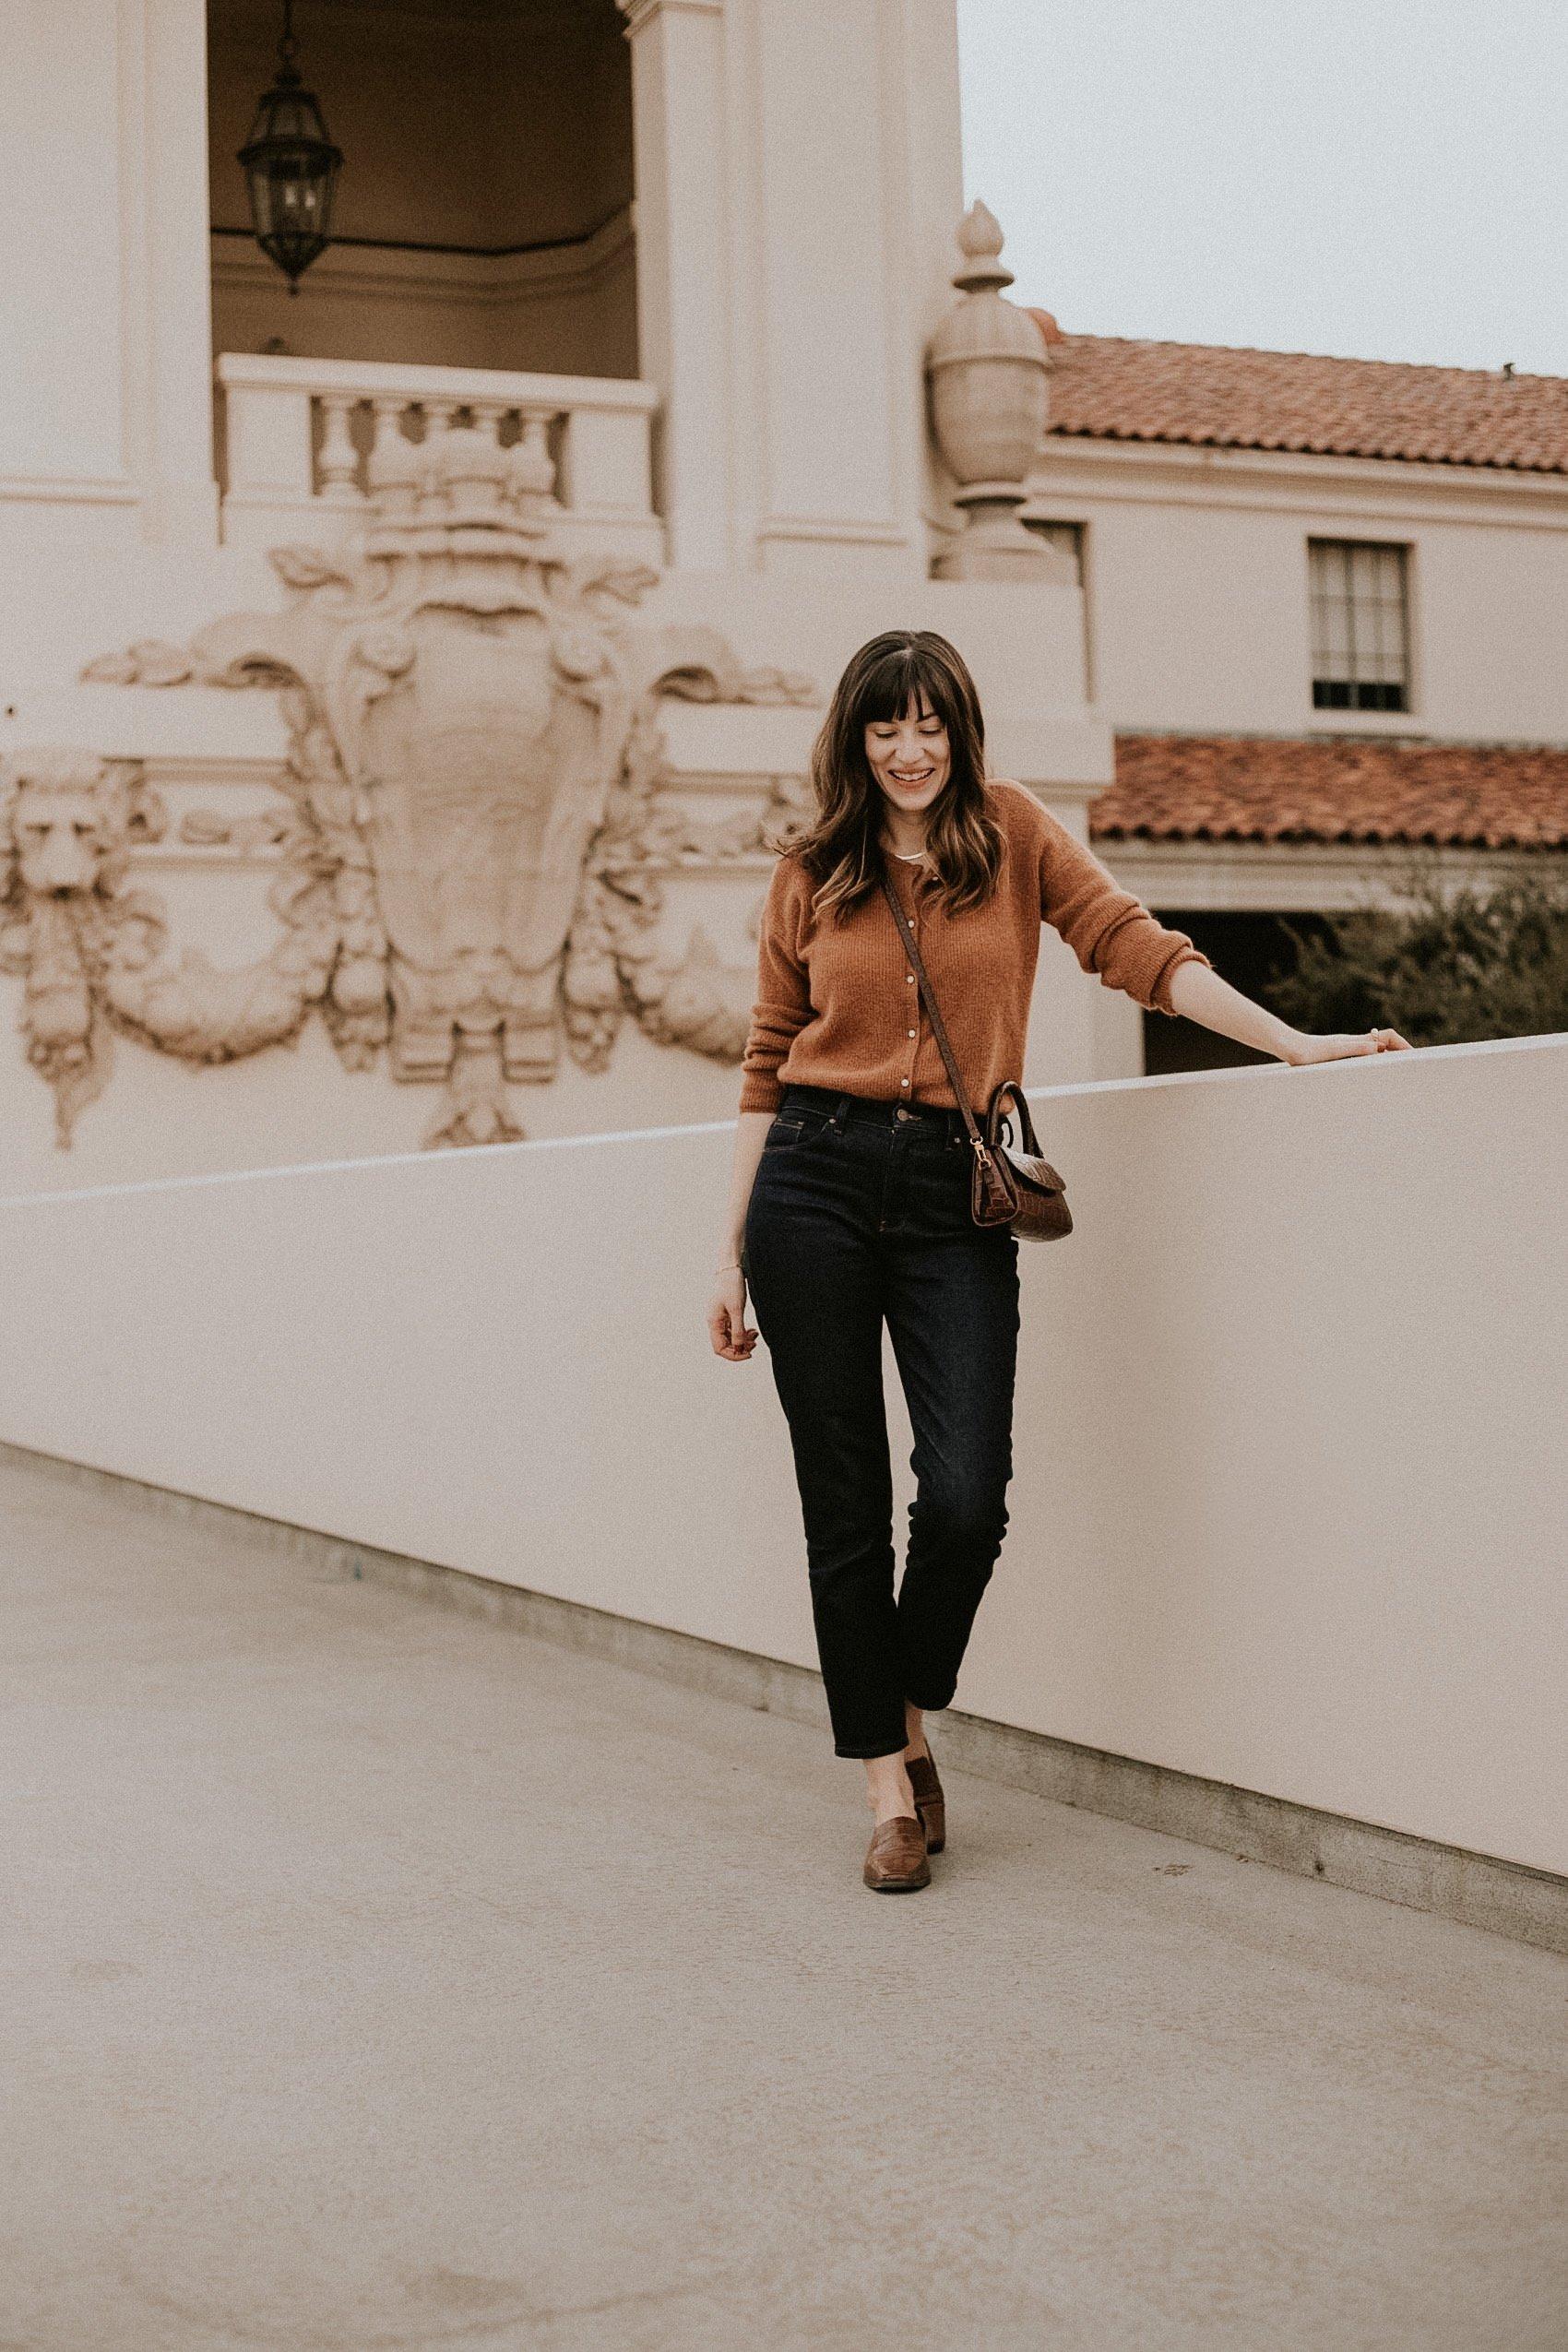 Mott + Bow Denim Review, Los Angeles Blogger wearing dark wash denim, brown cardigan sweater.